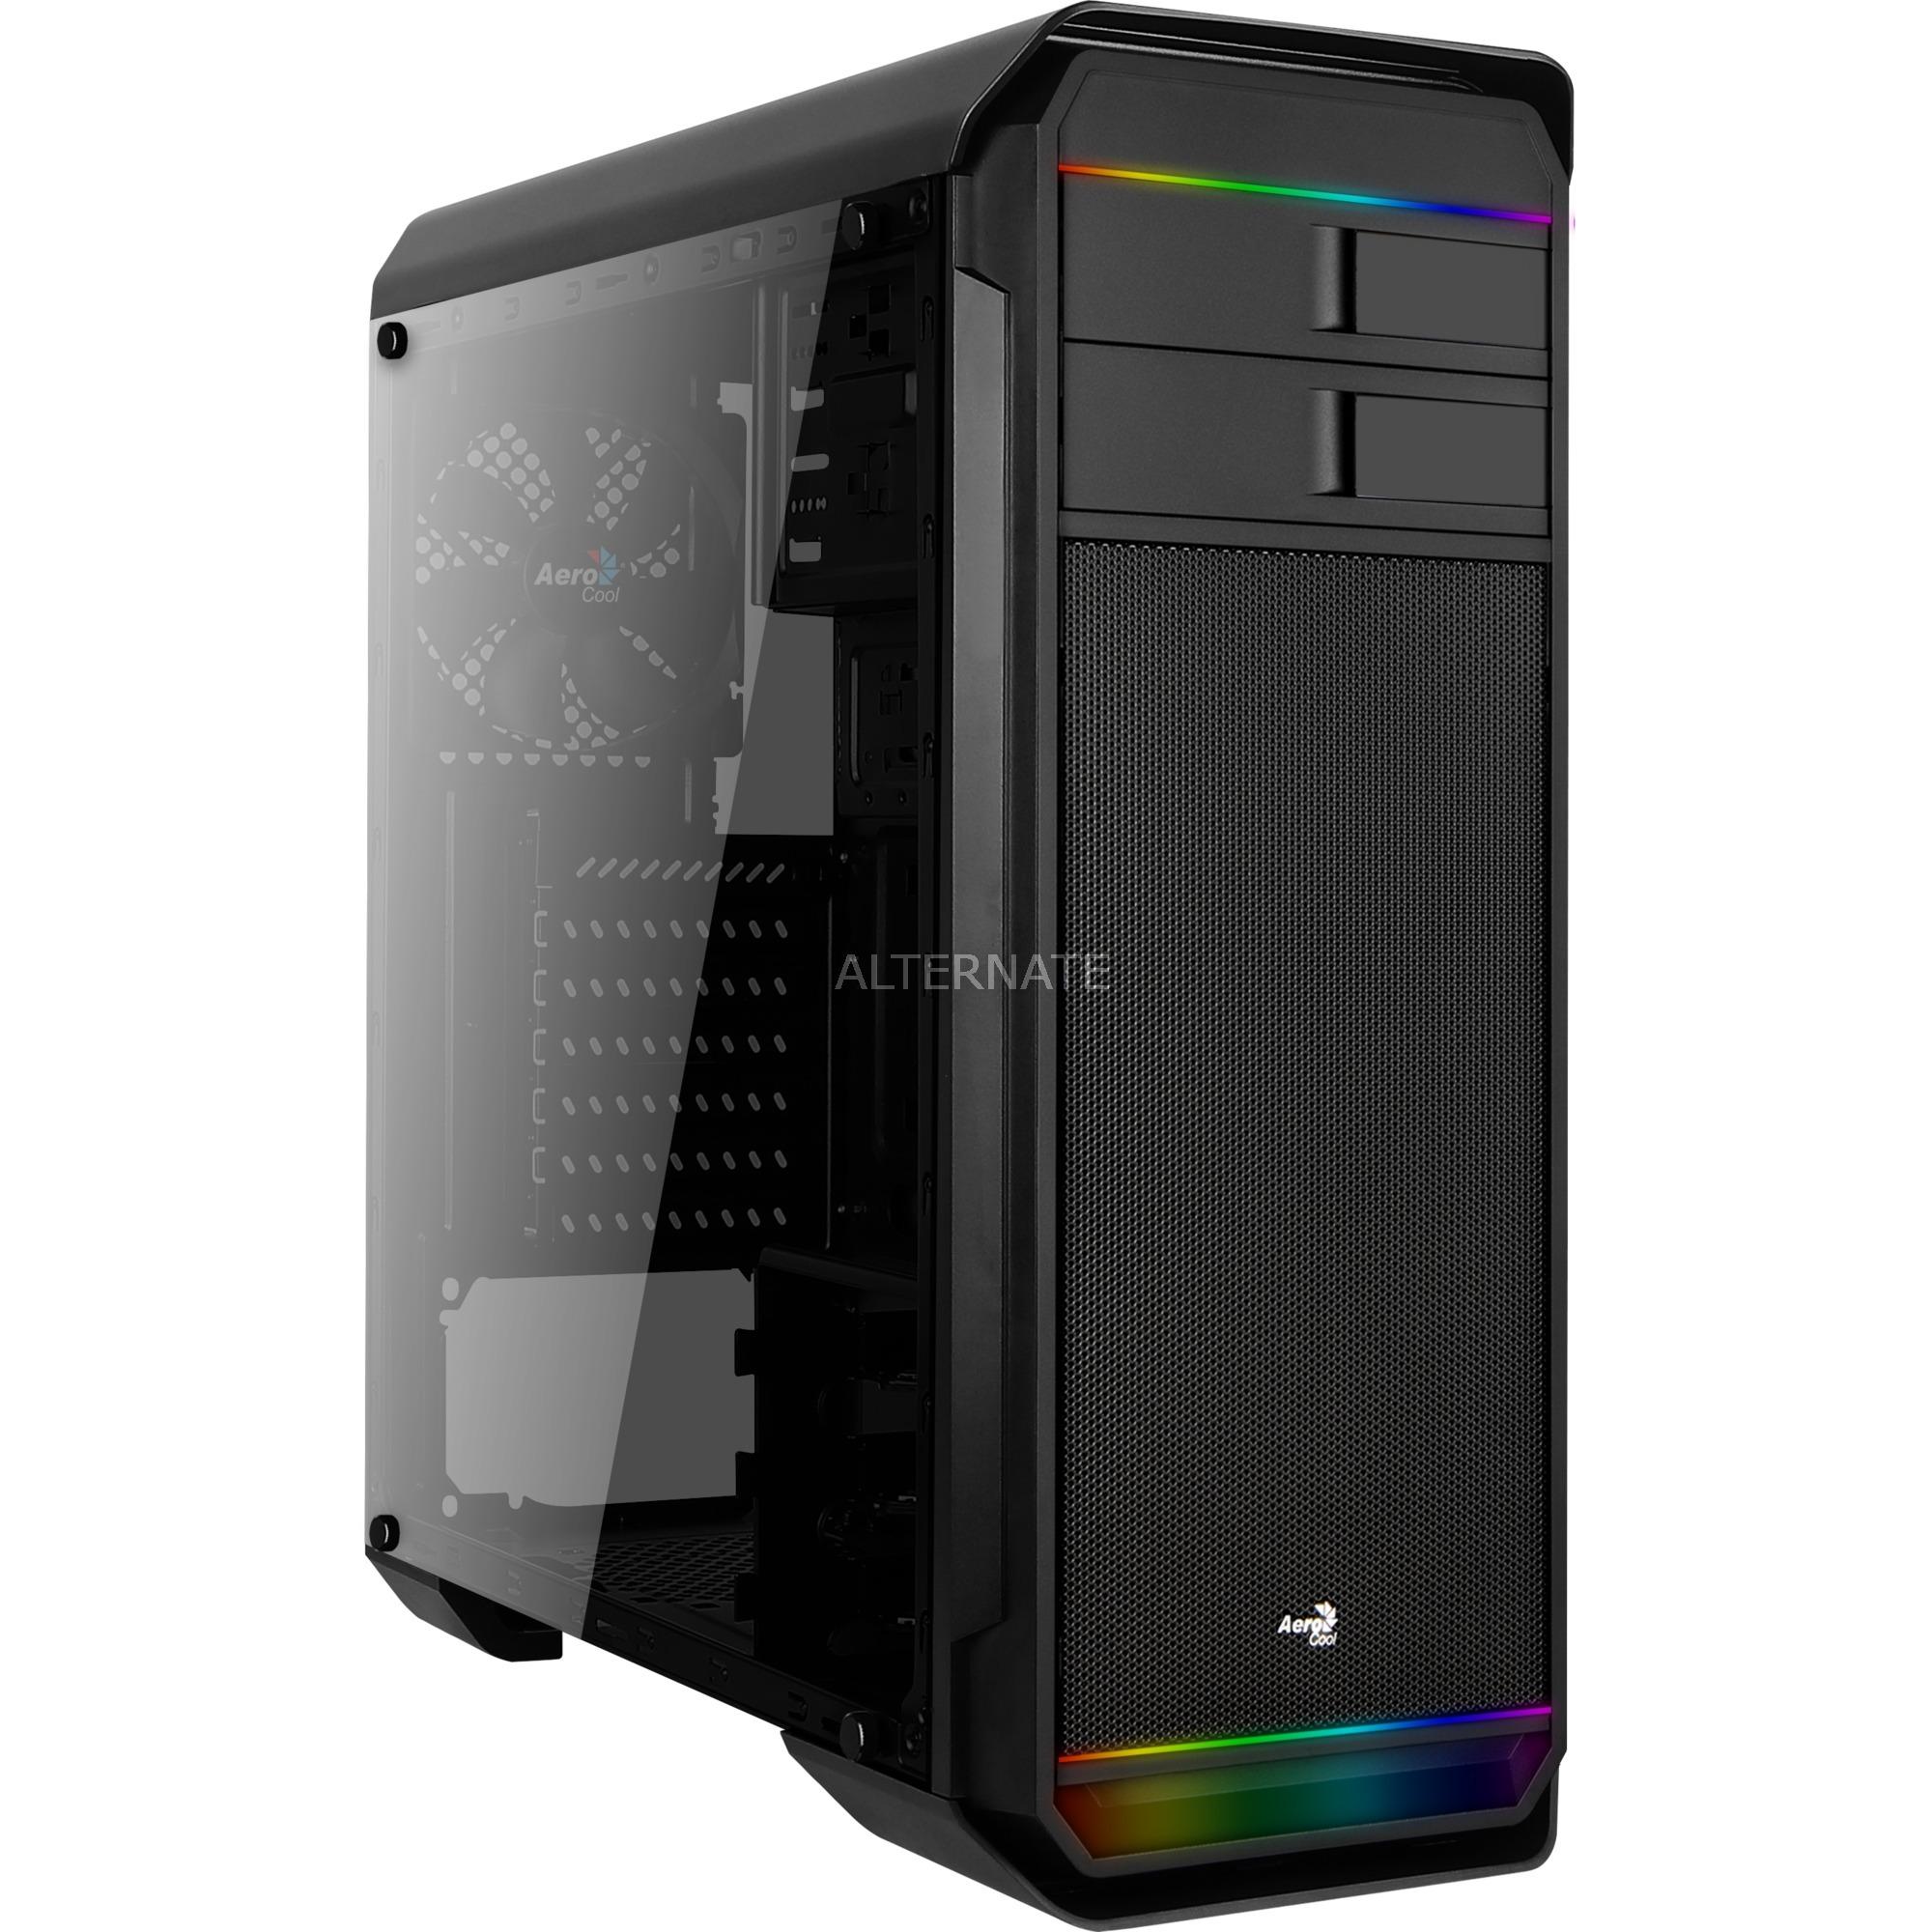 AERO-500G RGB Midi-Tower Negro, Cajas de torre